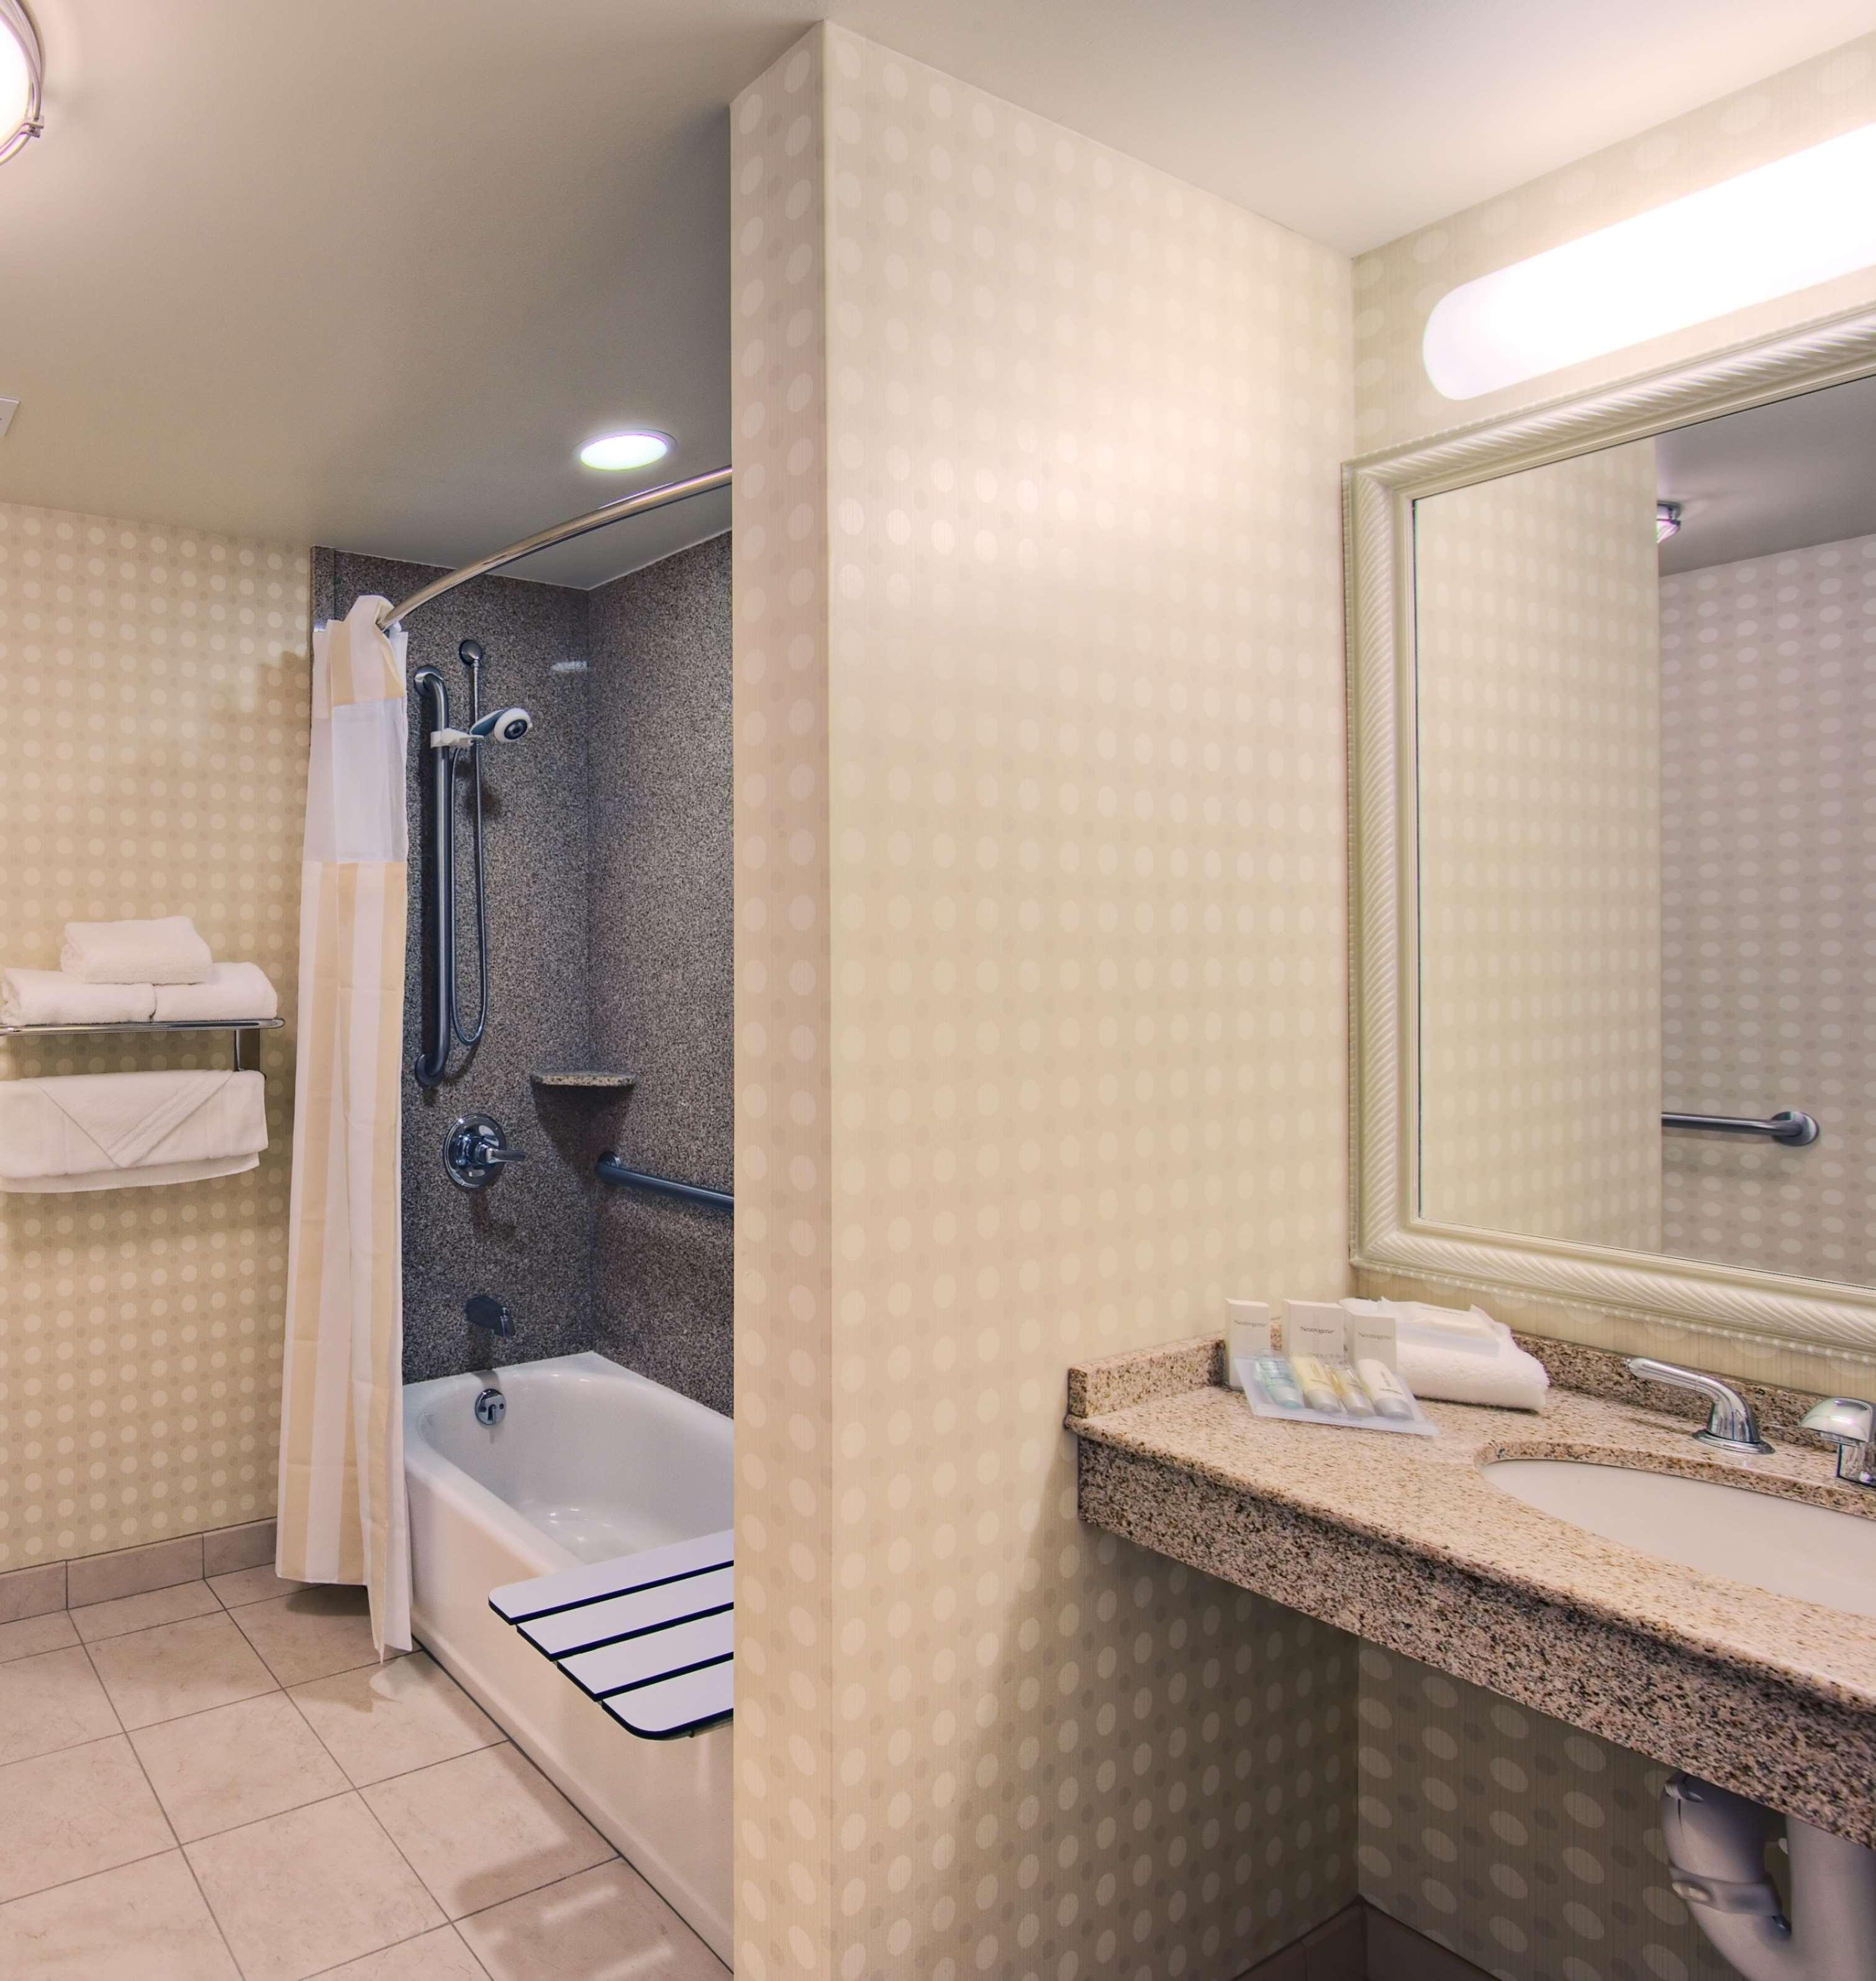 Hilton Garden Inn Laramie image 35